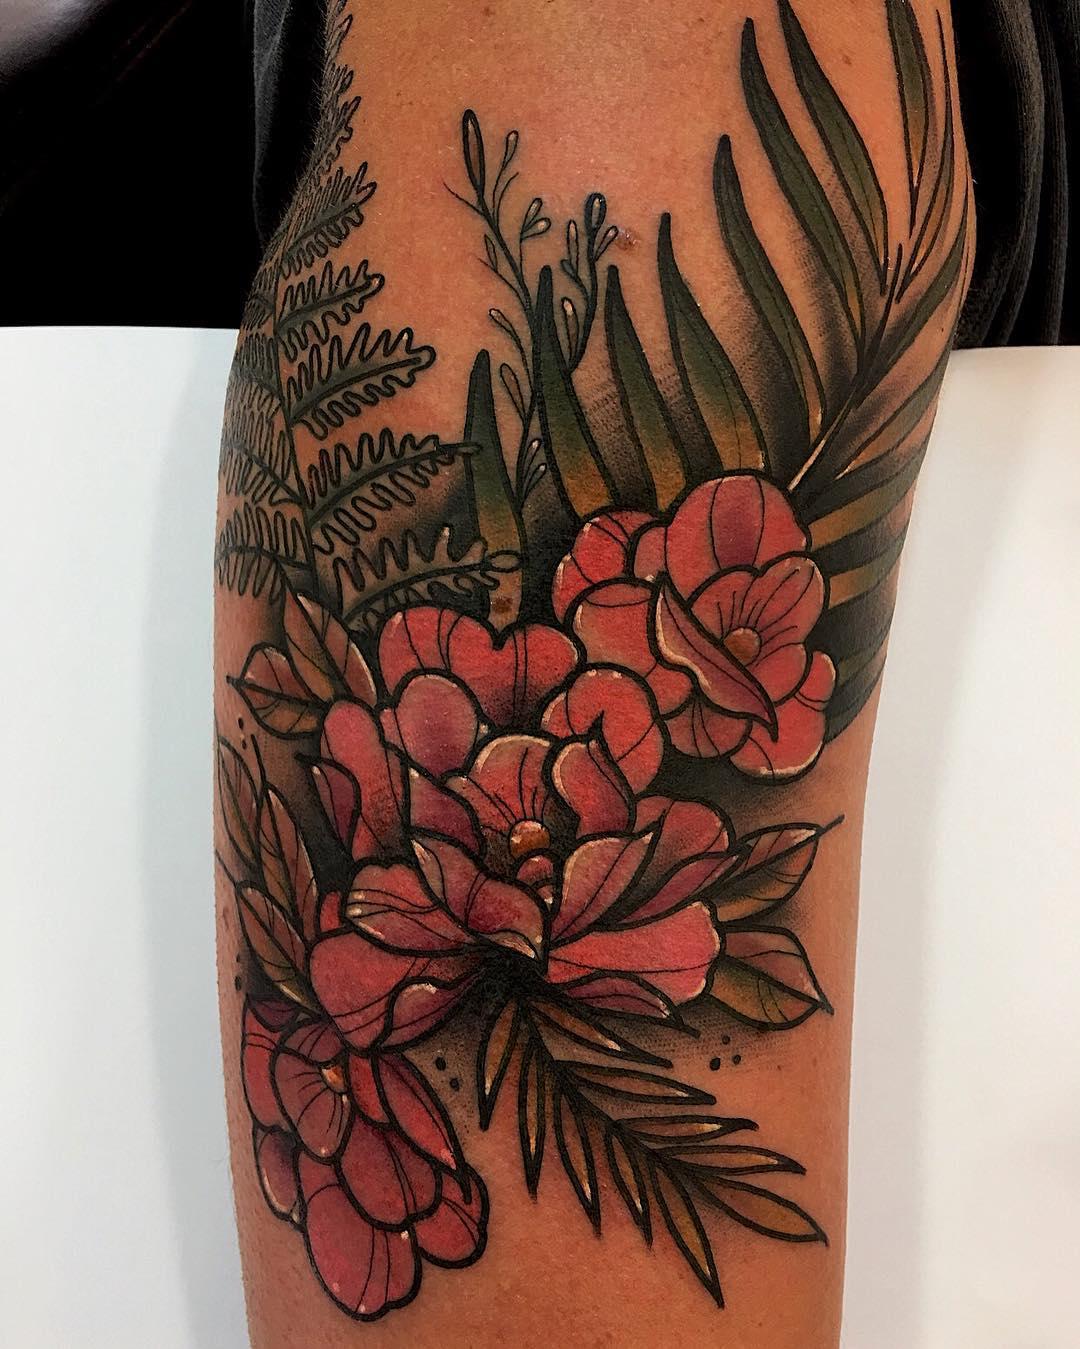 followforfollow,followme,follow,ciudadreal,tattoos,ciudadrealtattoo,tattooshop,tattooers,besttattooers,juantabasco,ciudadrealsetatua,ink,inkmaster,tatuajes,realismo,realistictattoo,ciudadrealtattoo,americanatattoos,traditionaltattoos,oldwork,madonna,eeuu,inked,inkedlife,inkedsociety,art,amazingink,tattooart,oldlines,oldschooltattoo,topclasstattooing